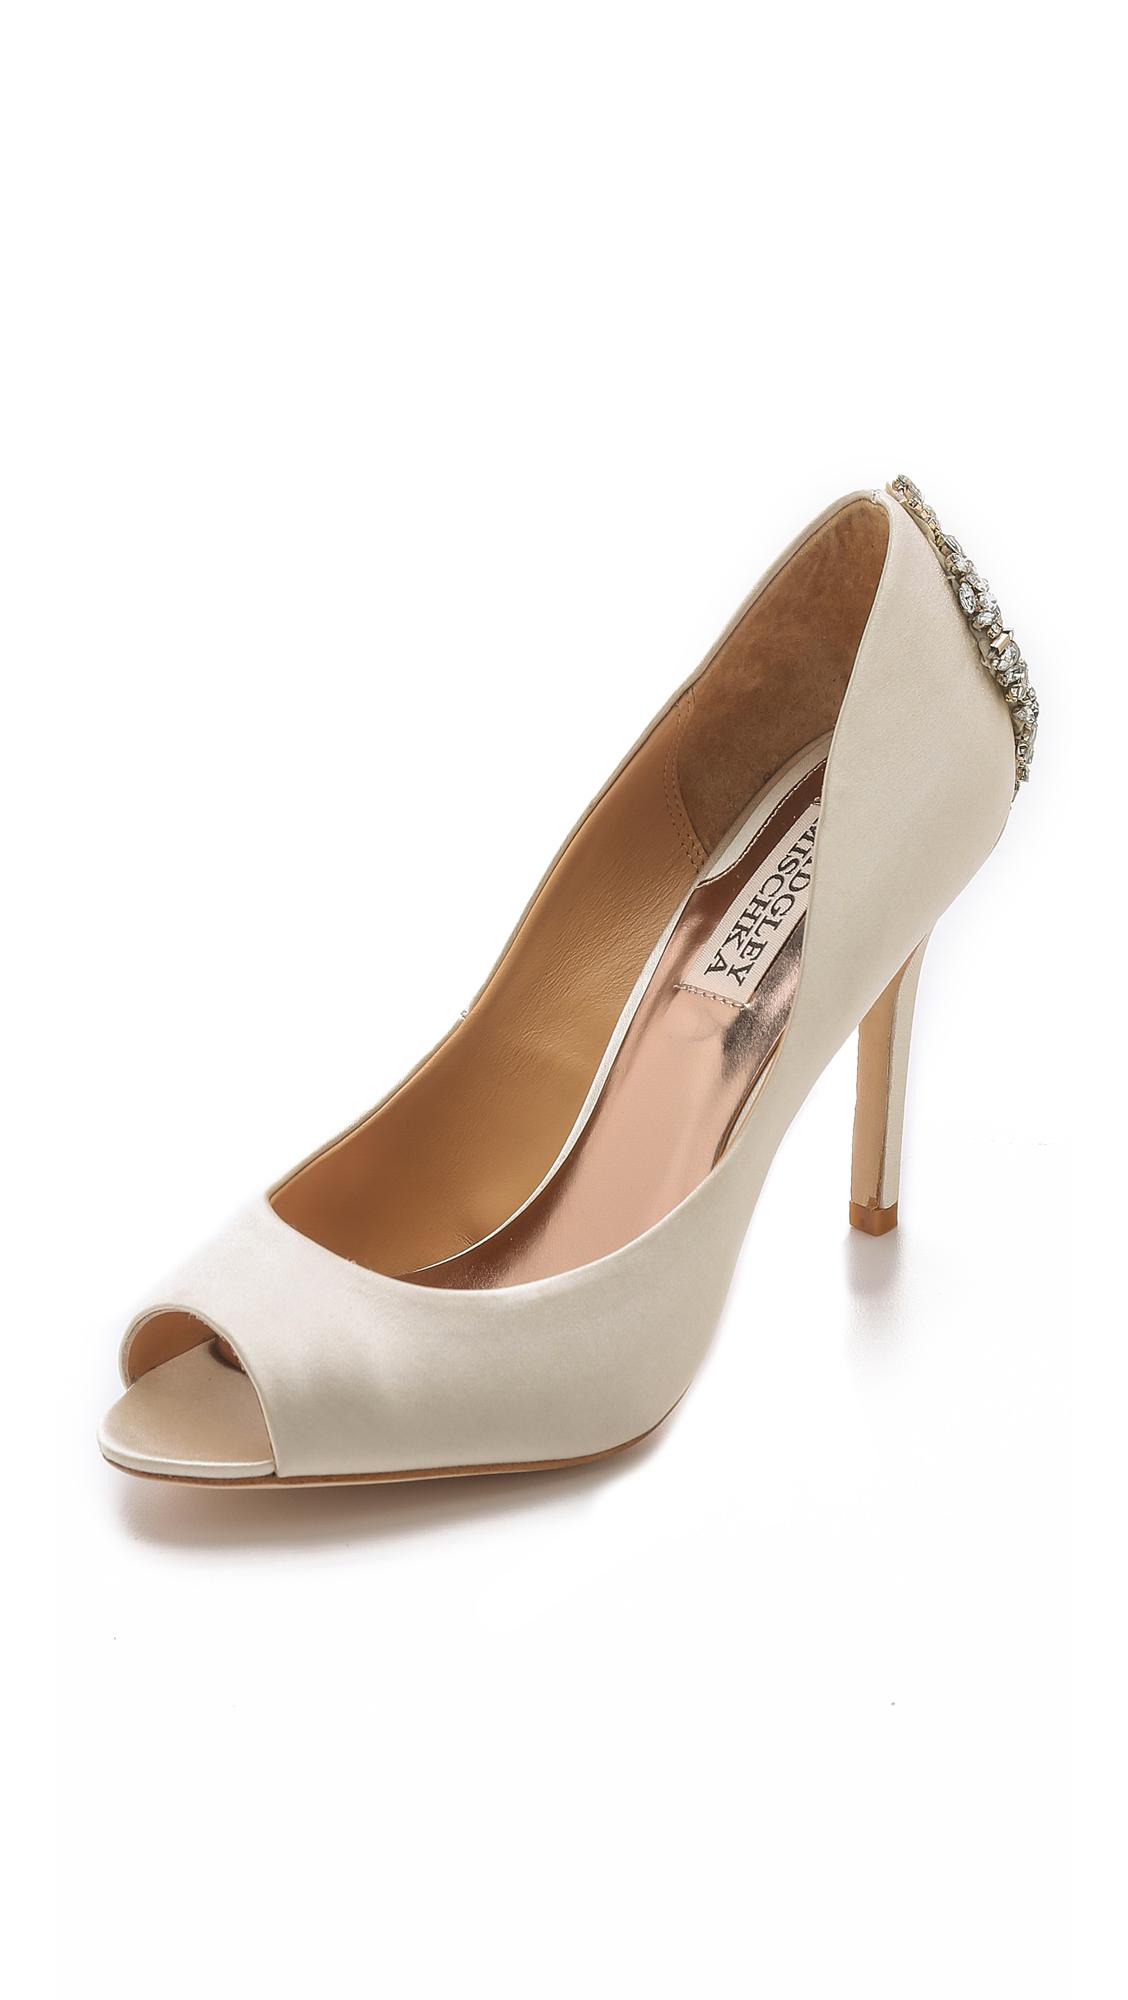 Badgley Mischka Nilla Peep-Toe Evening Pumps Women's Shoes In Ivory